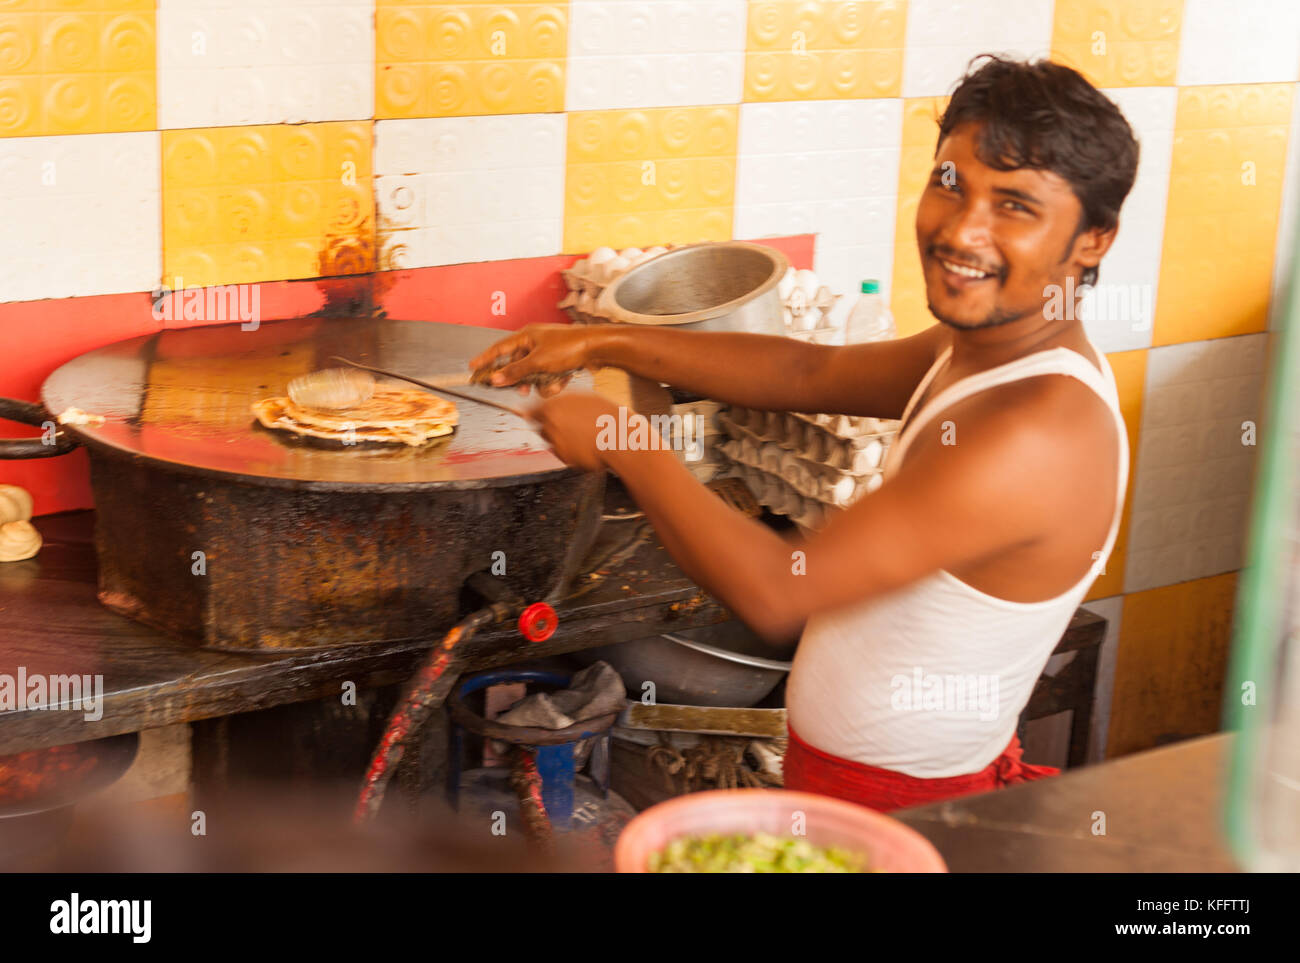 Kolkata street food vendor prepares a classic Bengali egg roll. - Stock Image